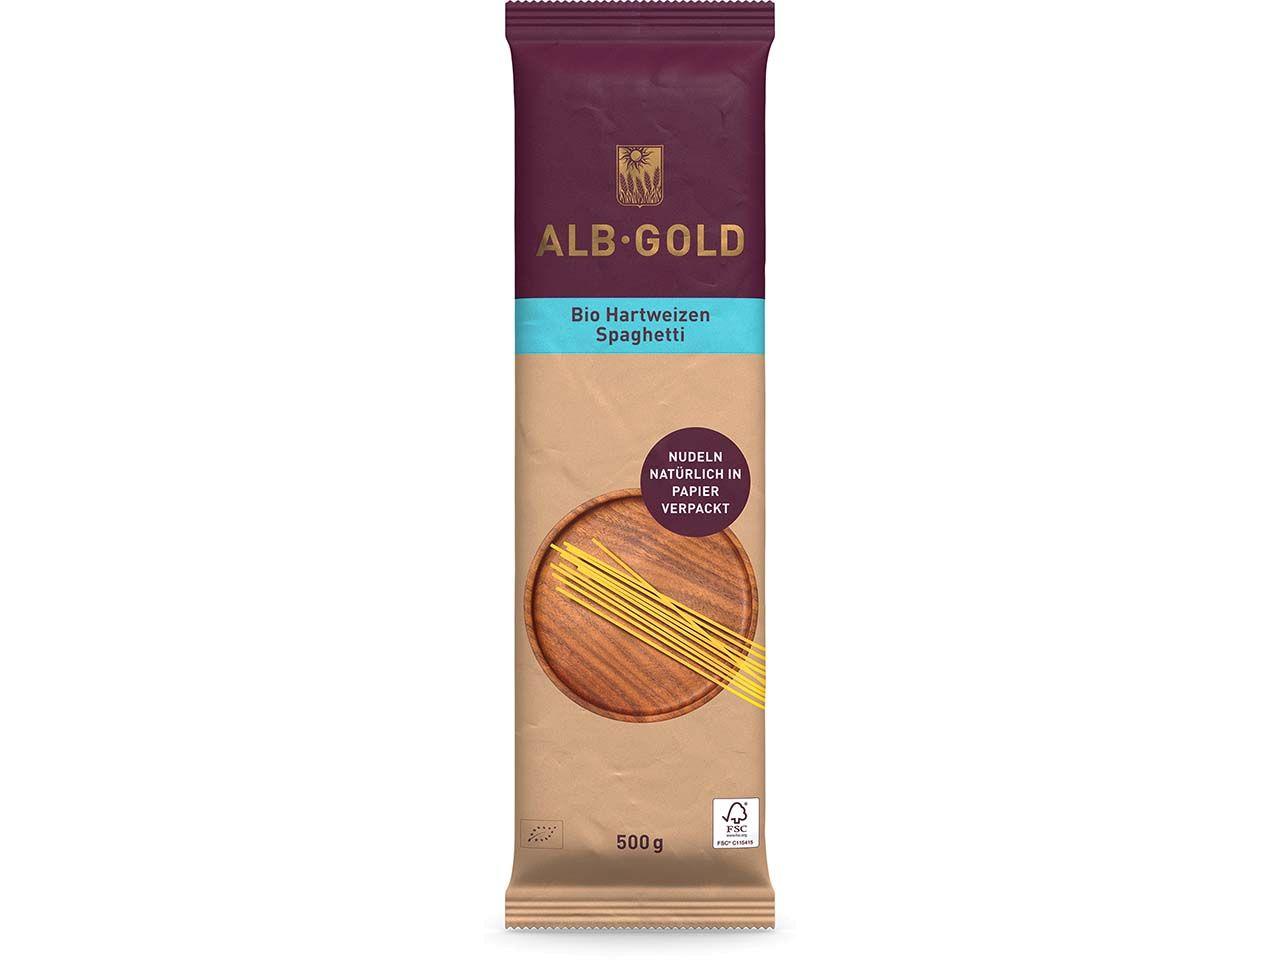 ALB-GOLD Bio-Hartweizen-Spaghetti 500 g 104034470